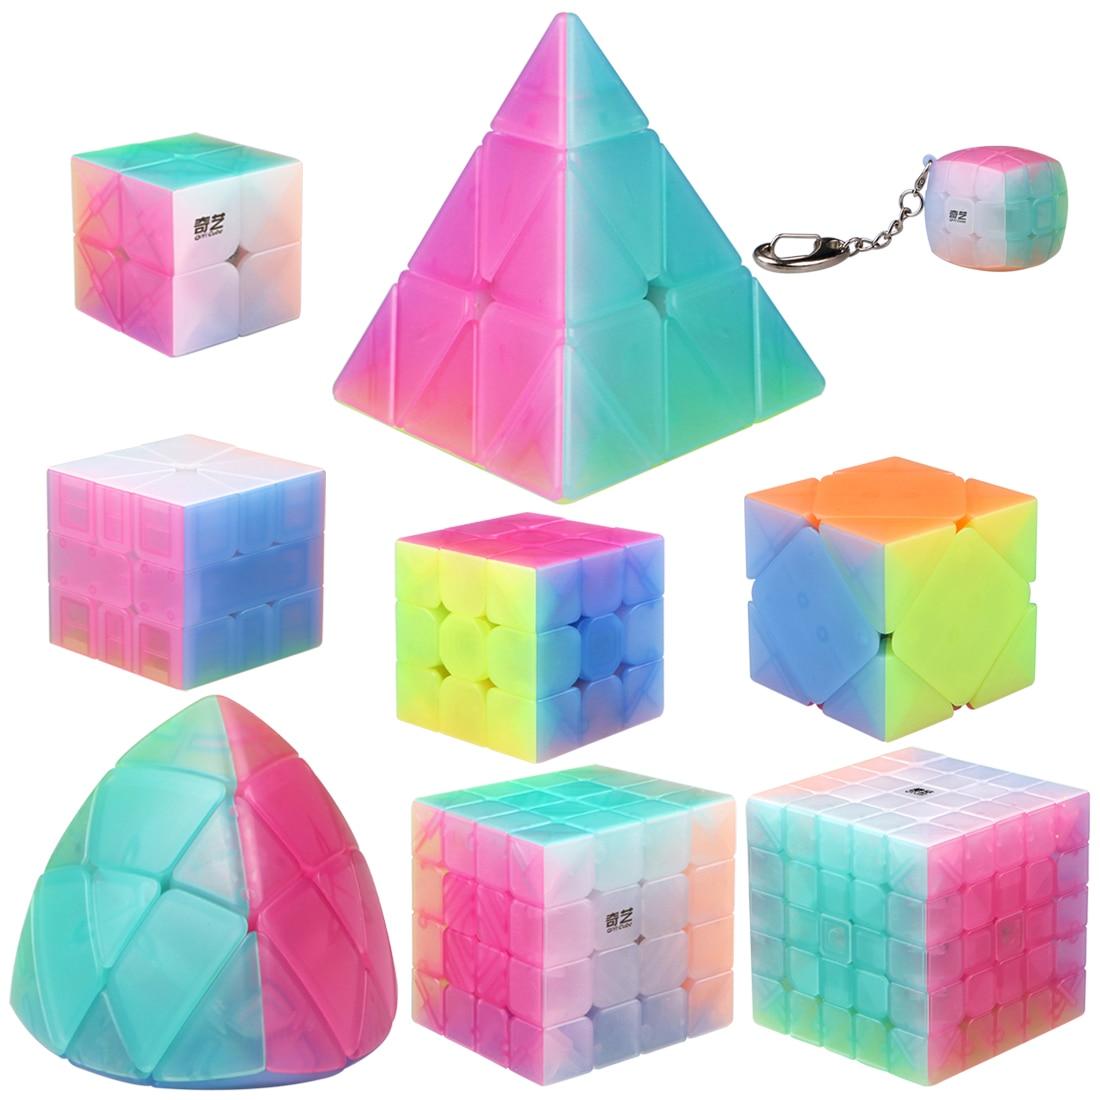 QiYi Jelly Cube Set Including Pyramid SQ 1 Mastermorphix 2x2 3x3 4x4 5x5 Magic Cube Kits